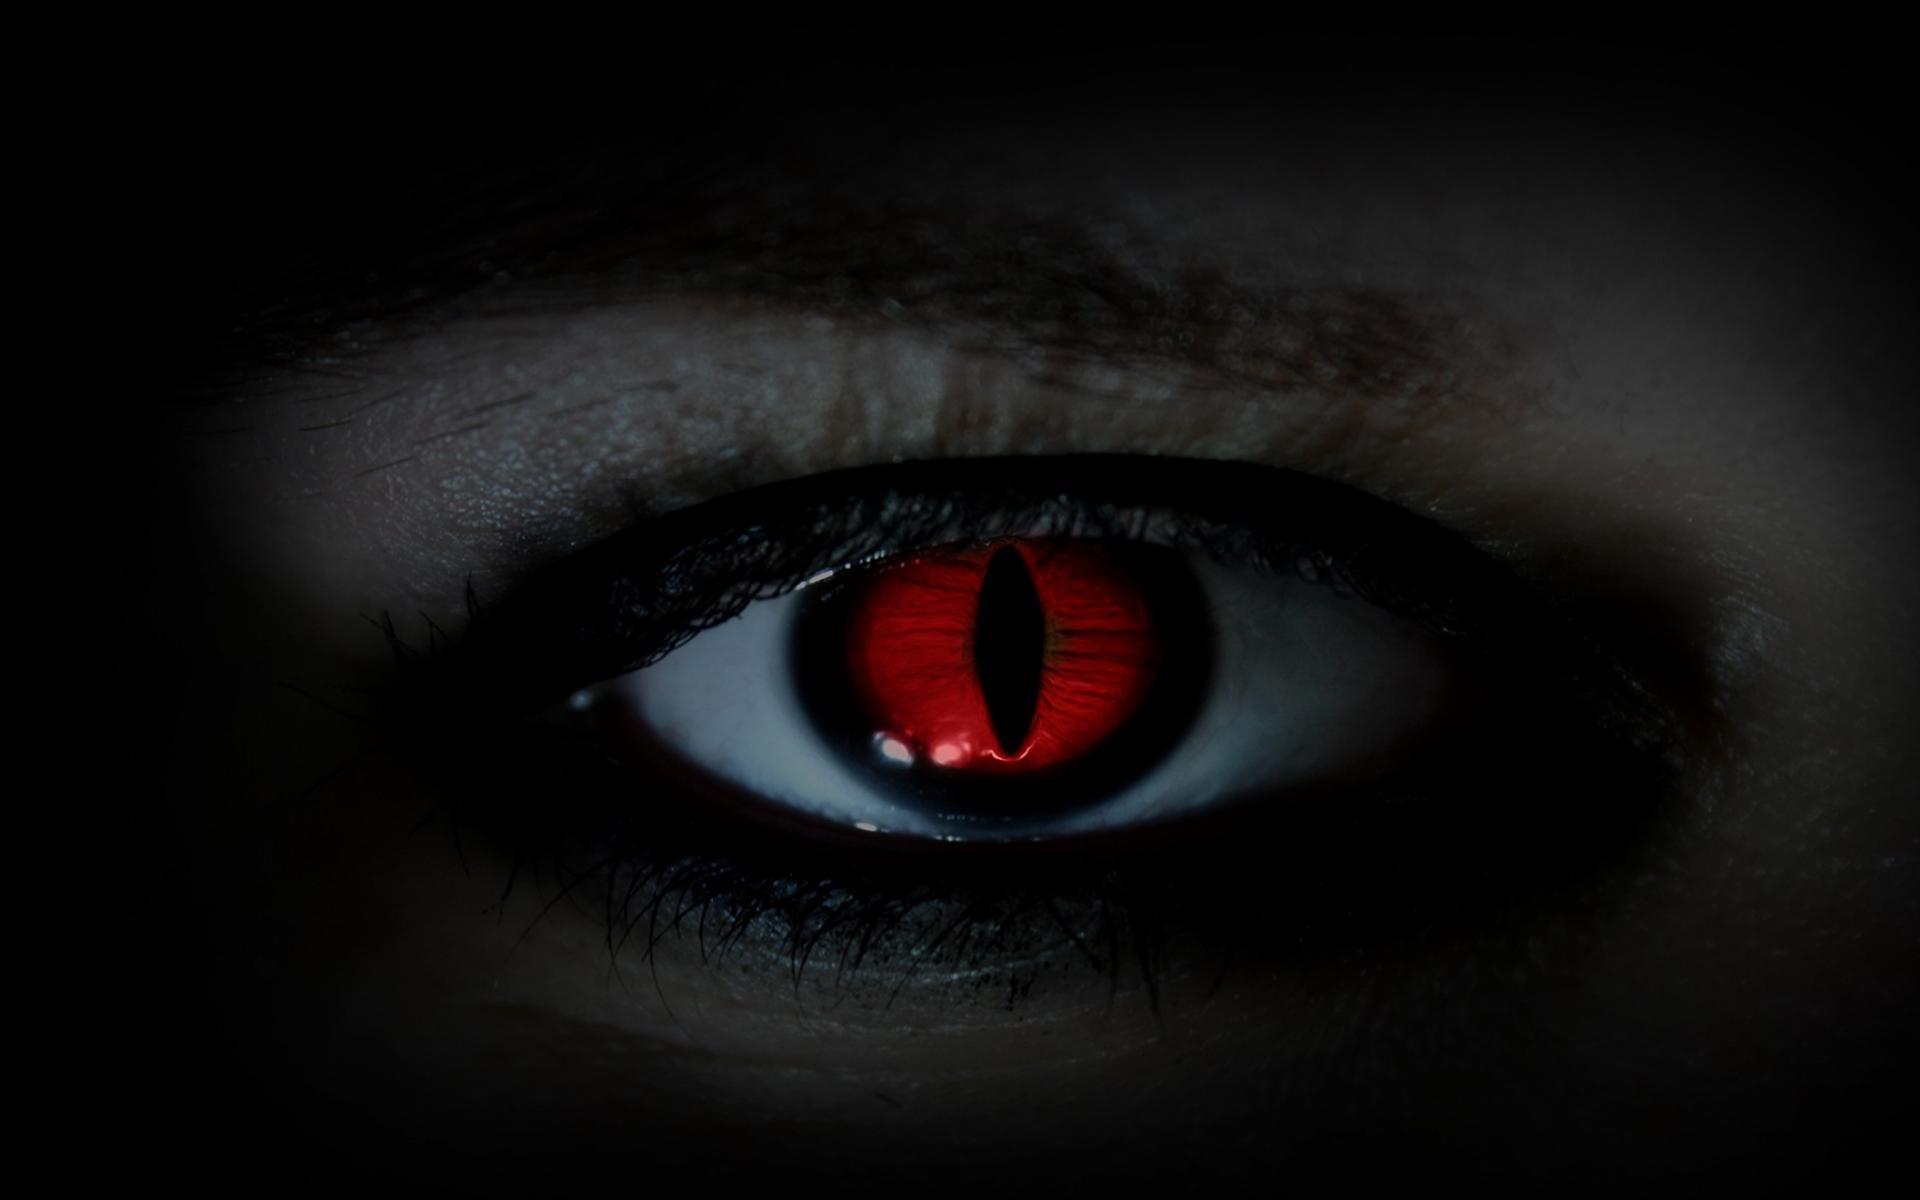 Eyes red devil wallpaper 36607 1920x1200